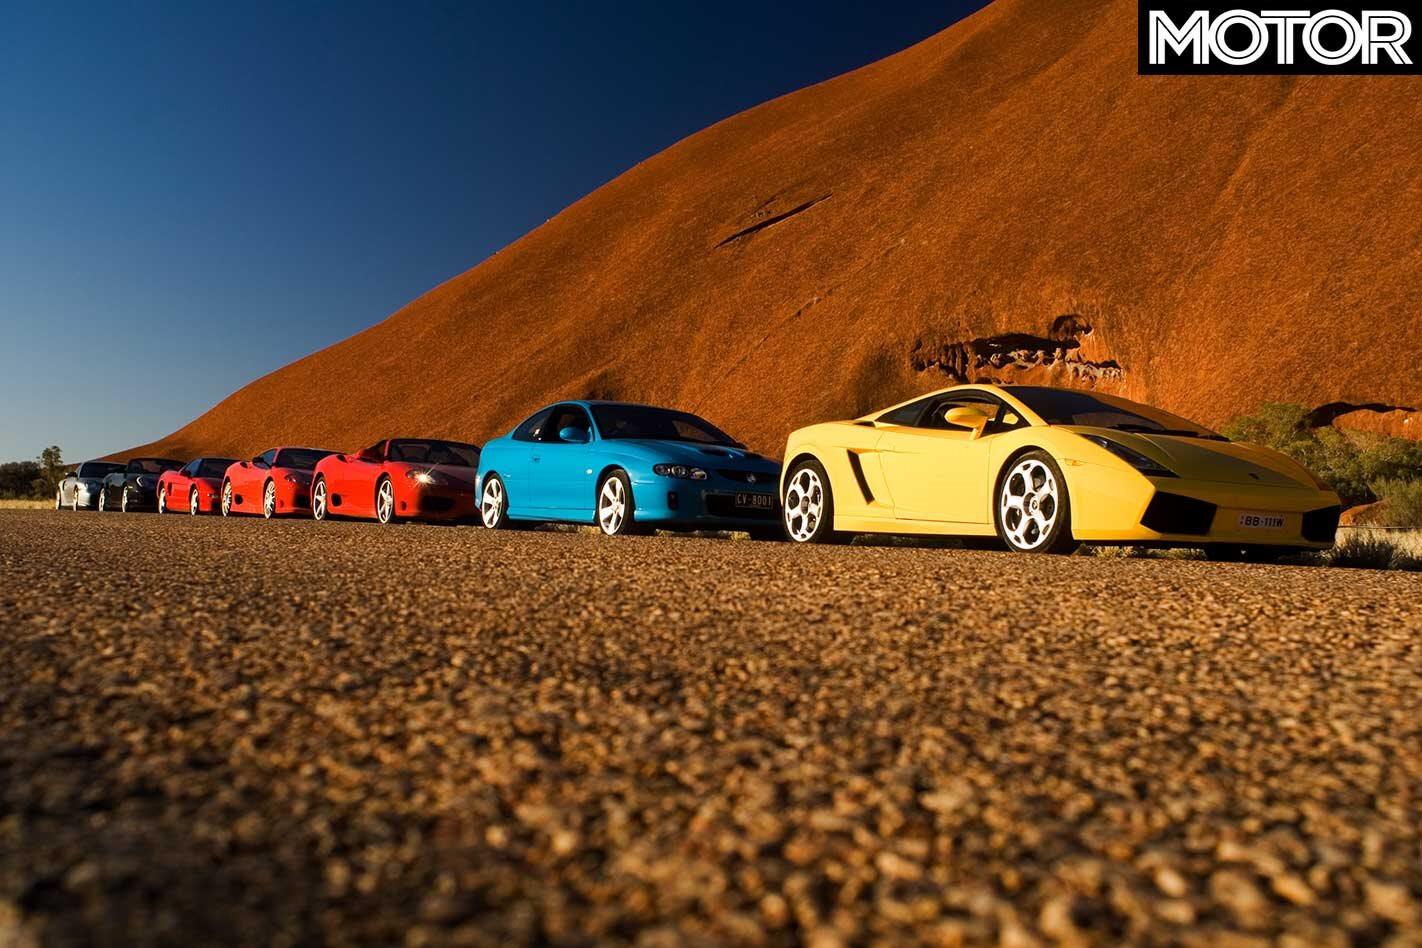 Supercars parked at Uluru